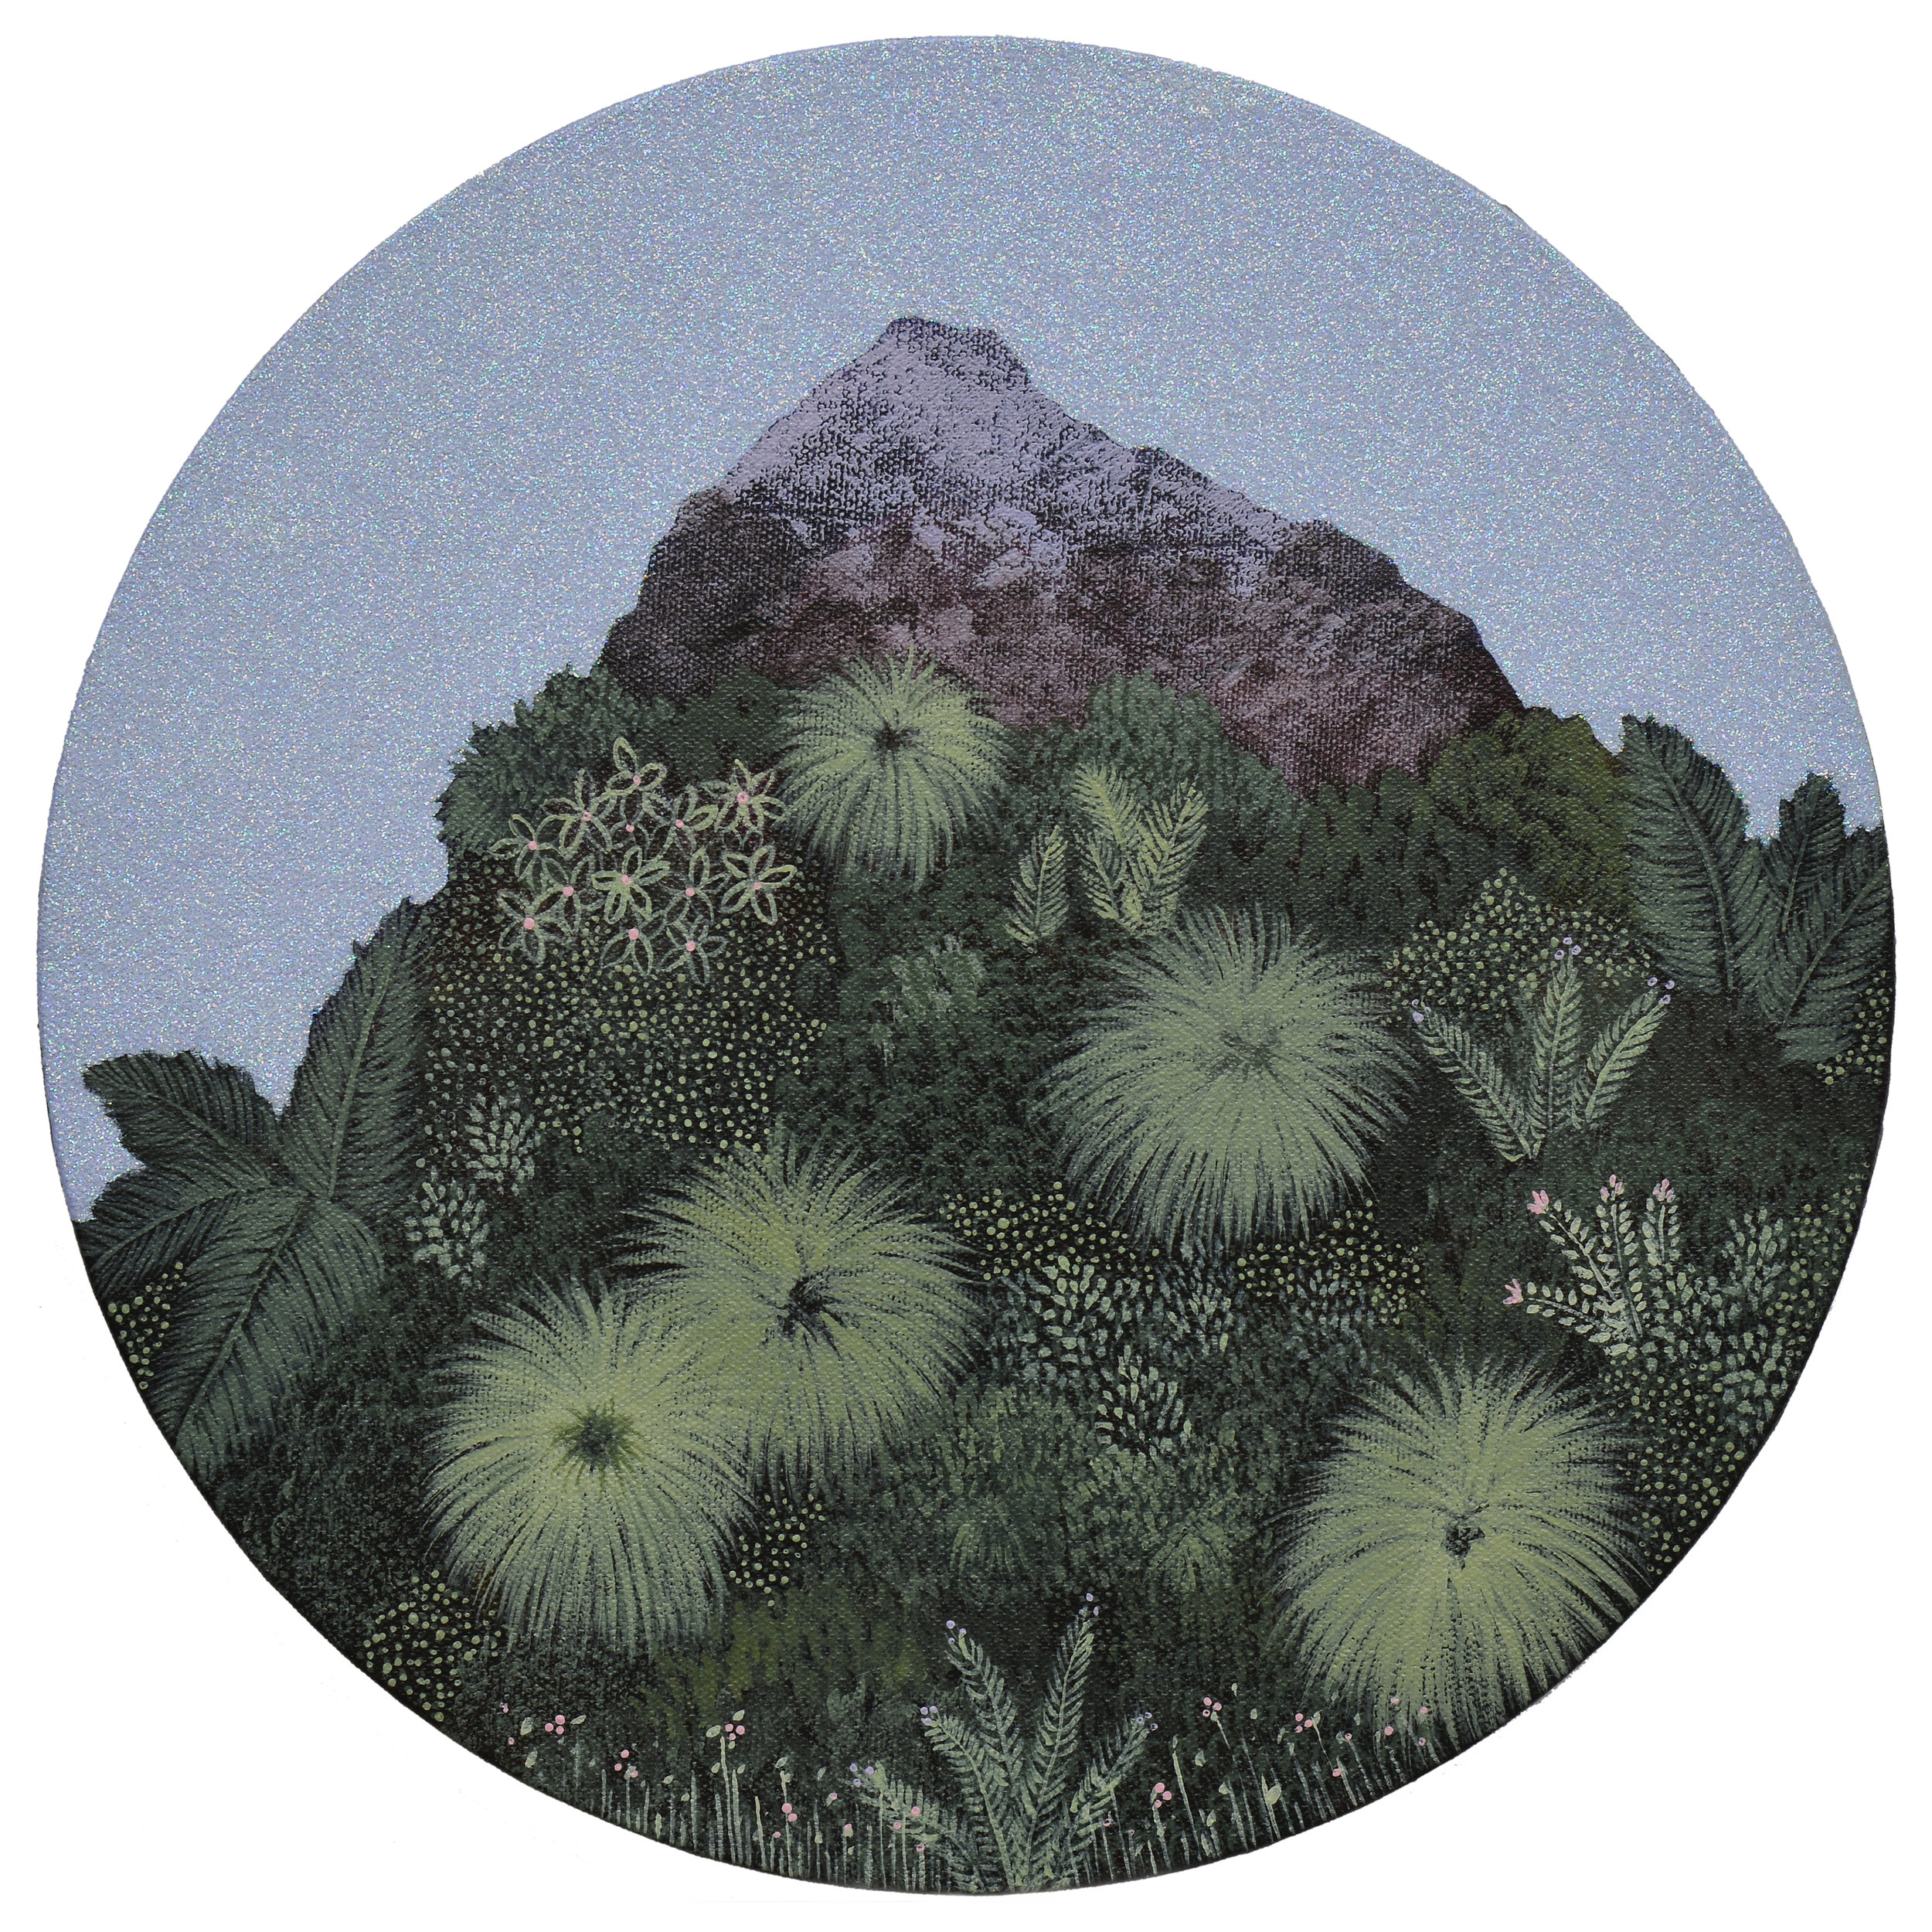 Marc Standing, Wilderness 6 , 2016, acrylic on canvas, 30 x 30 cm